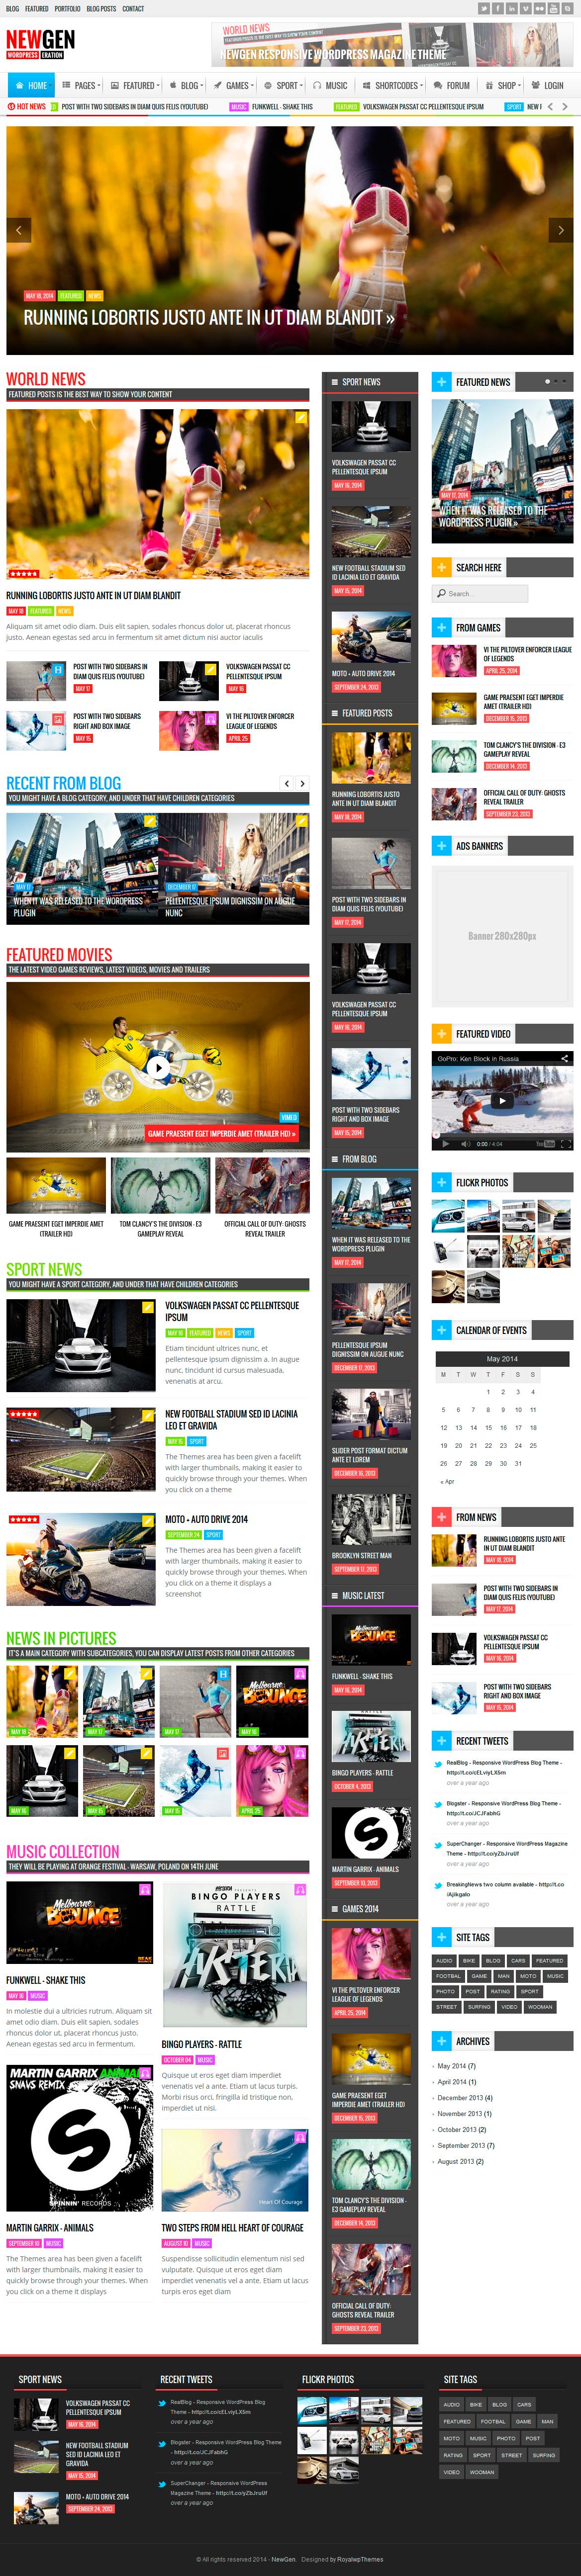 Newgen - Responsive News/Magazine WordPress Theme by RoyalwpThemes